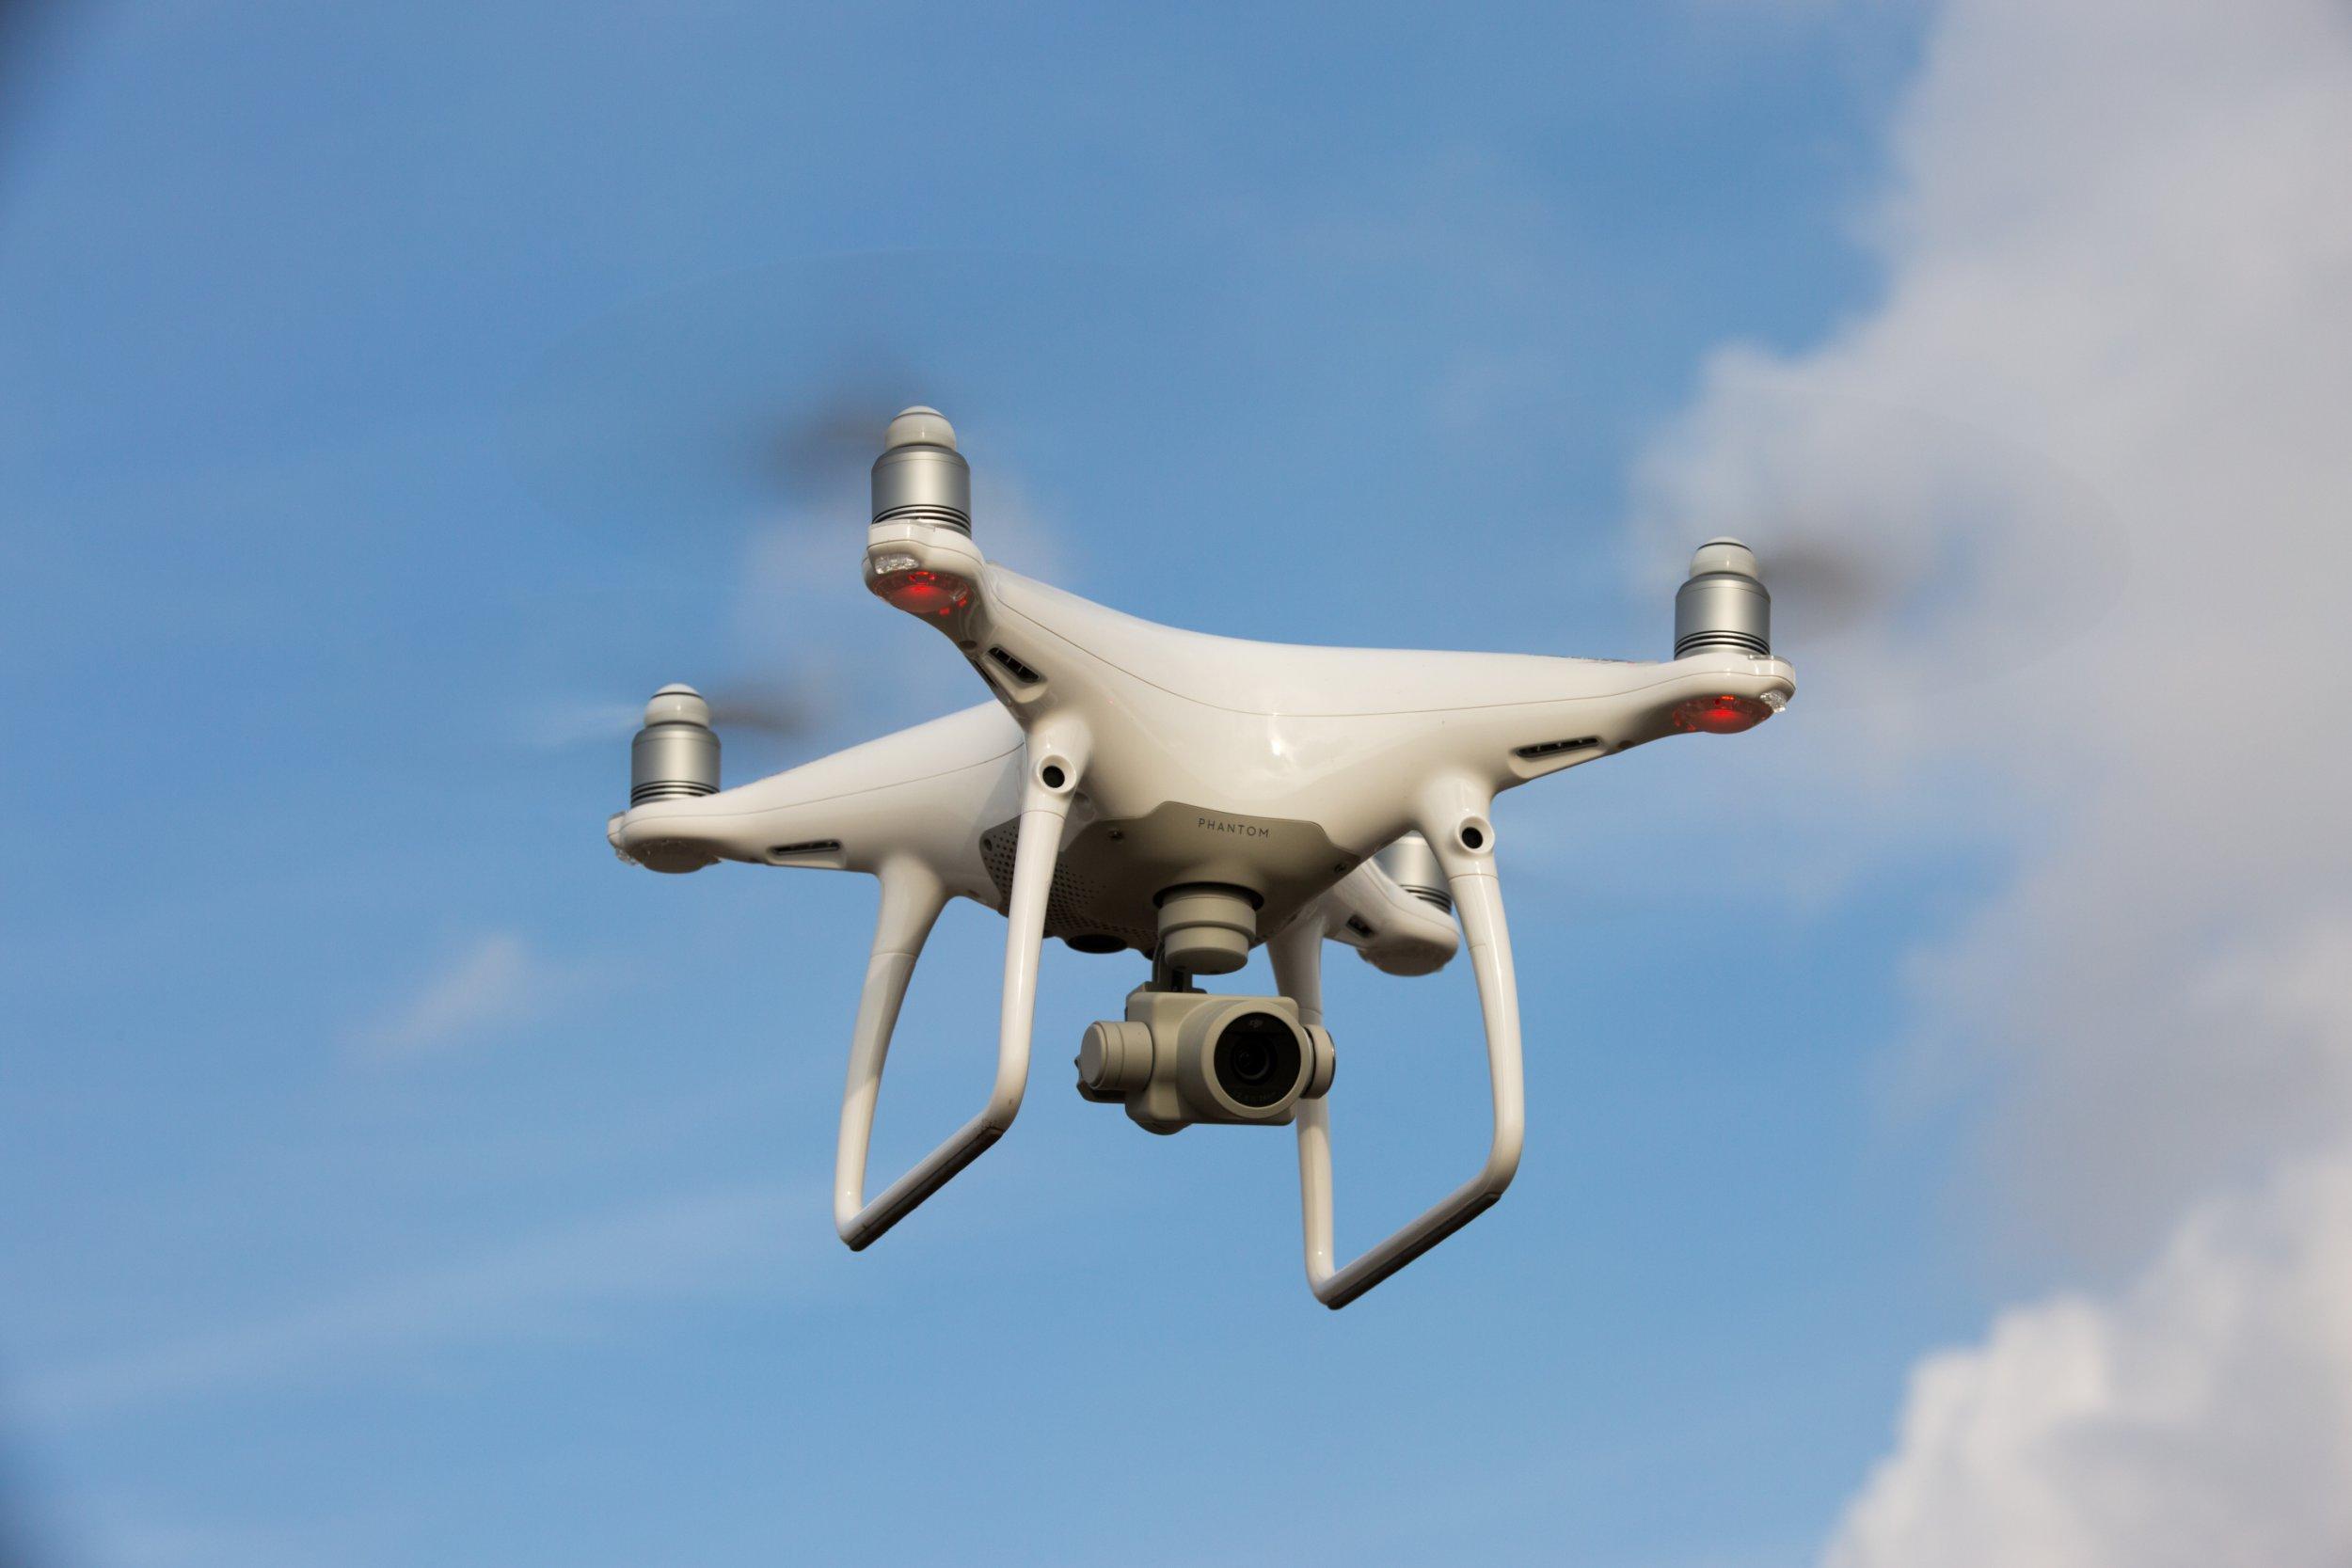 Mandatory Credit: Photo by Geoff Robinson Photography/REX/Shutterstock (9457003g) DJI Phantom 4 Pro drone flying. DJI Phantom 4 Pro Drone, UK - Feb 2018